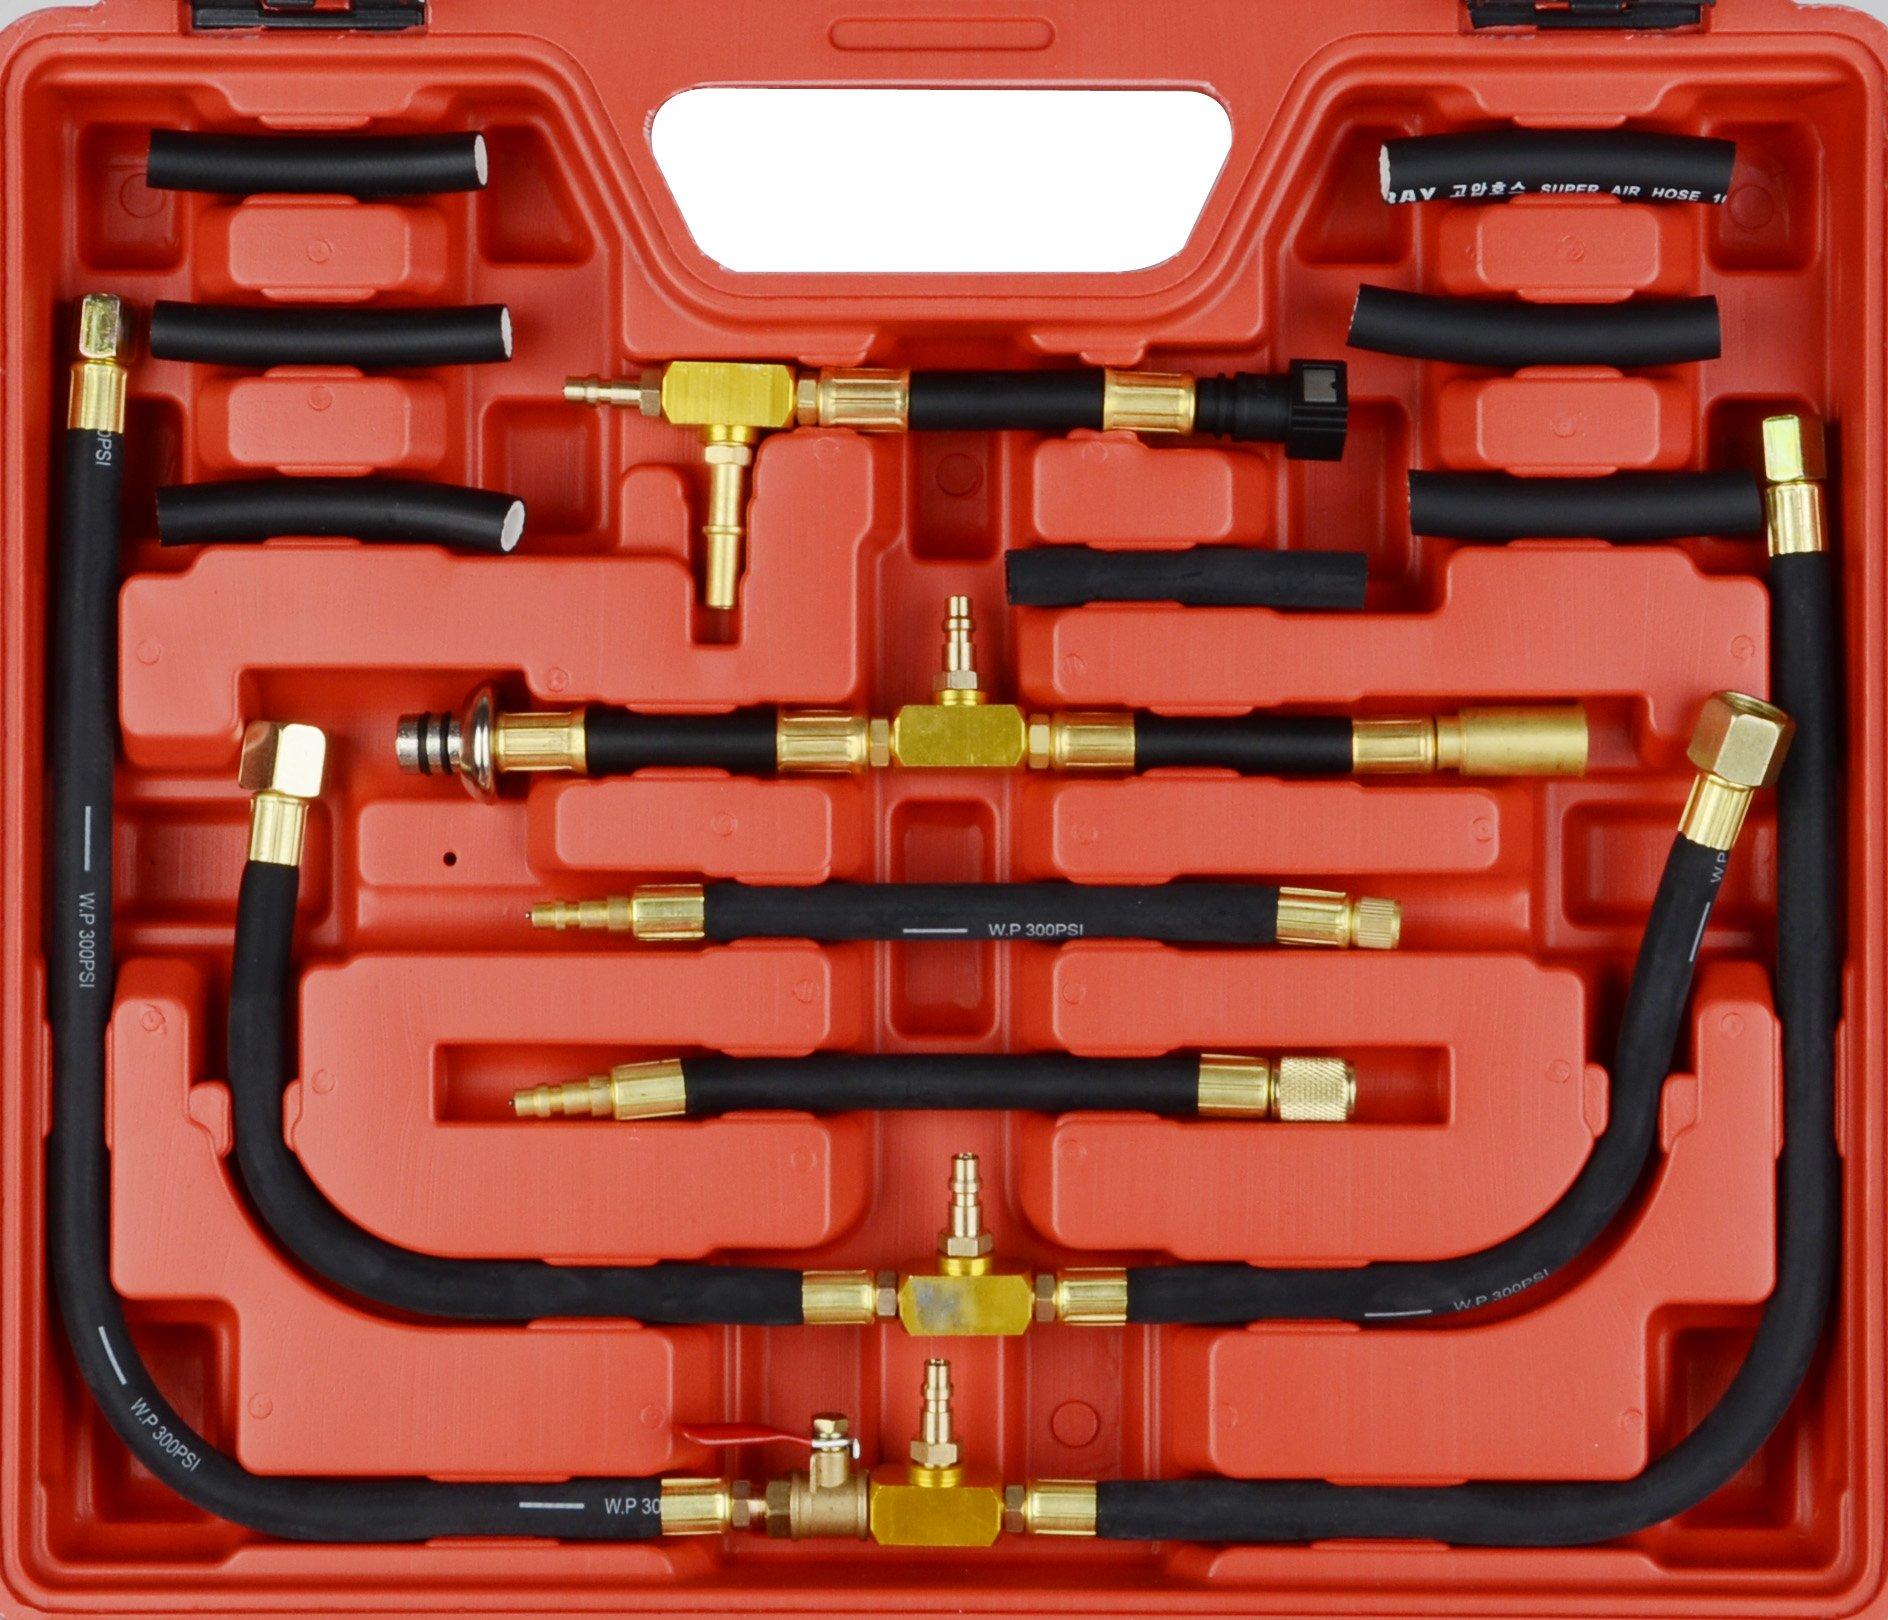 DA YUAN 0-140 PSI Fuel Injection Pressure Gauge Tester Tool Kit by DA YUAN (Image #2)